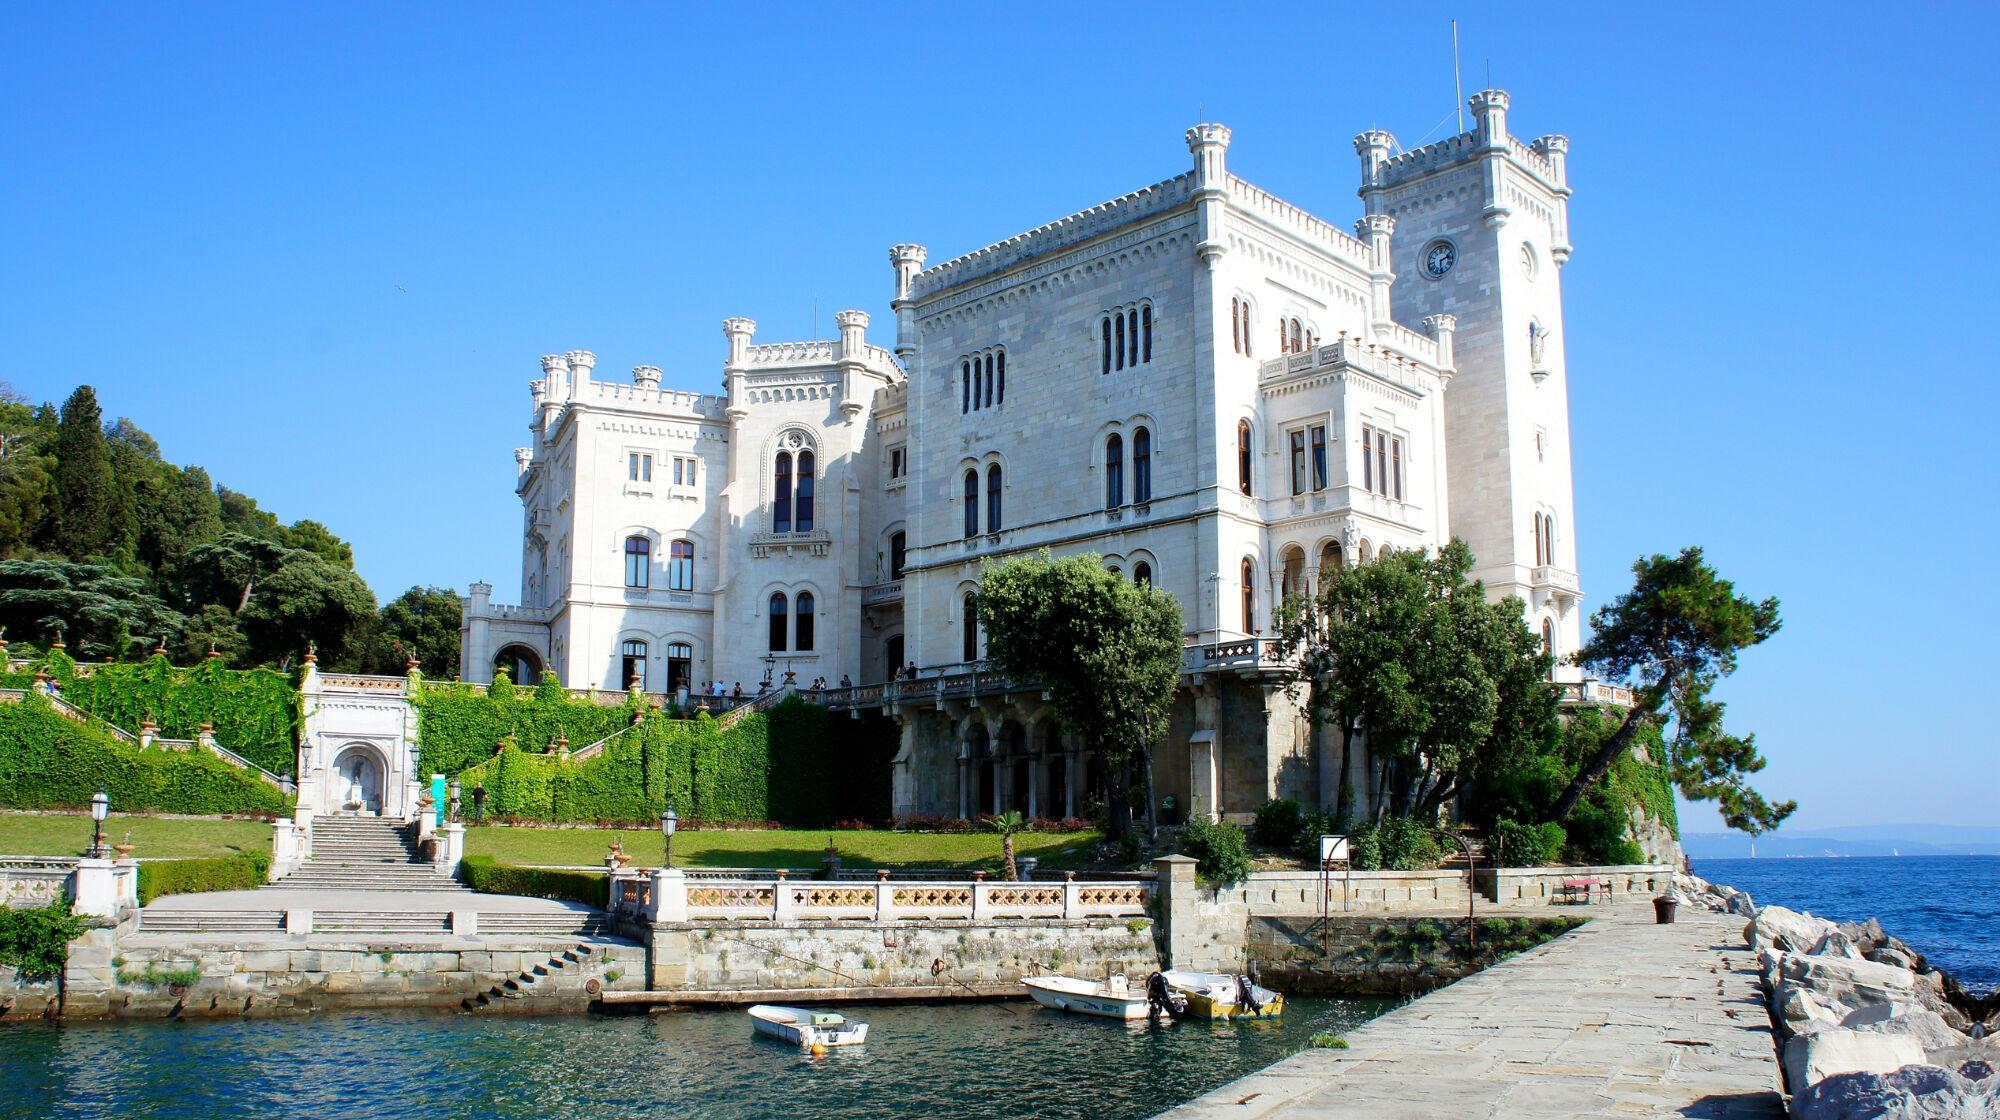 Schloss Miramare an der Adria